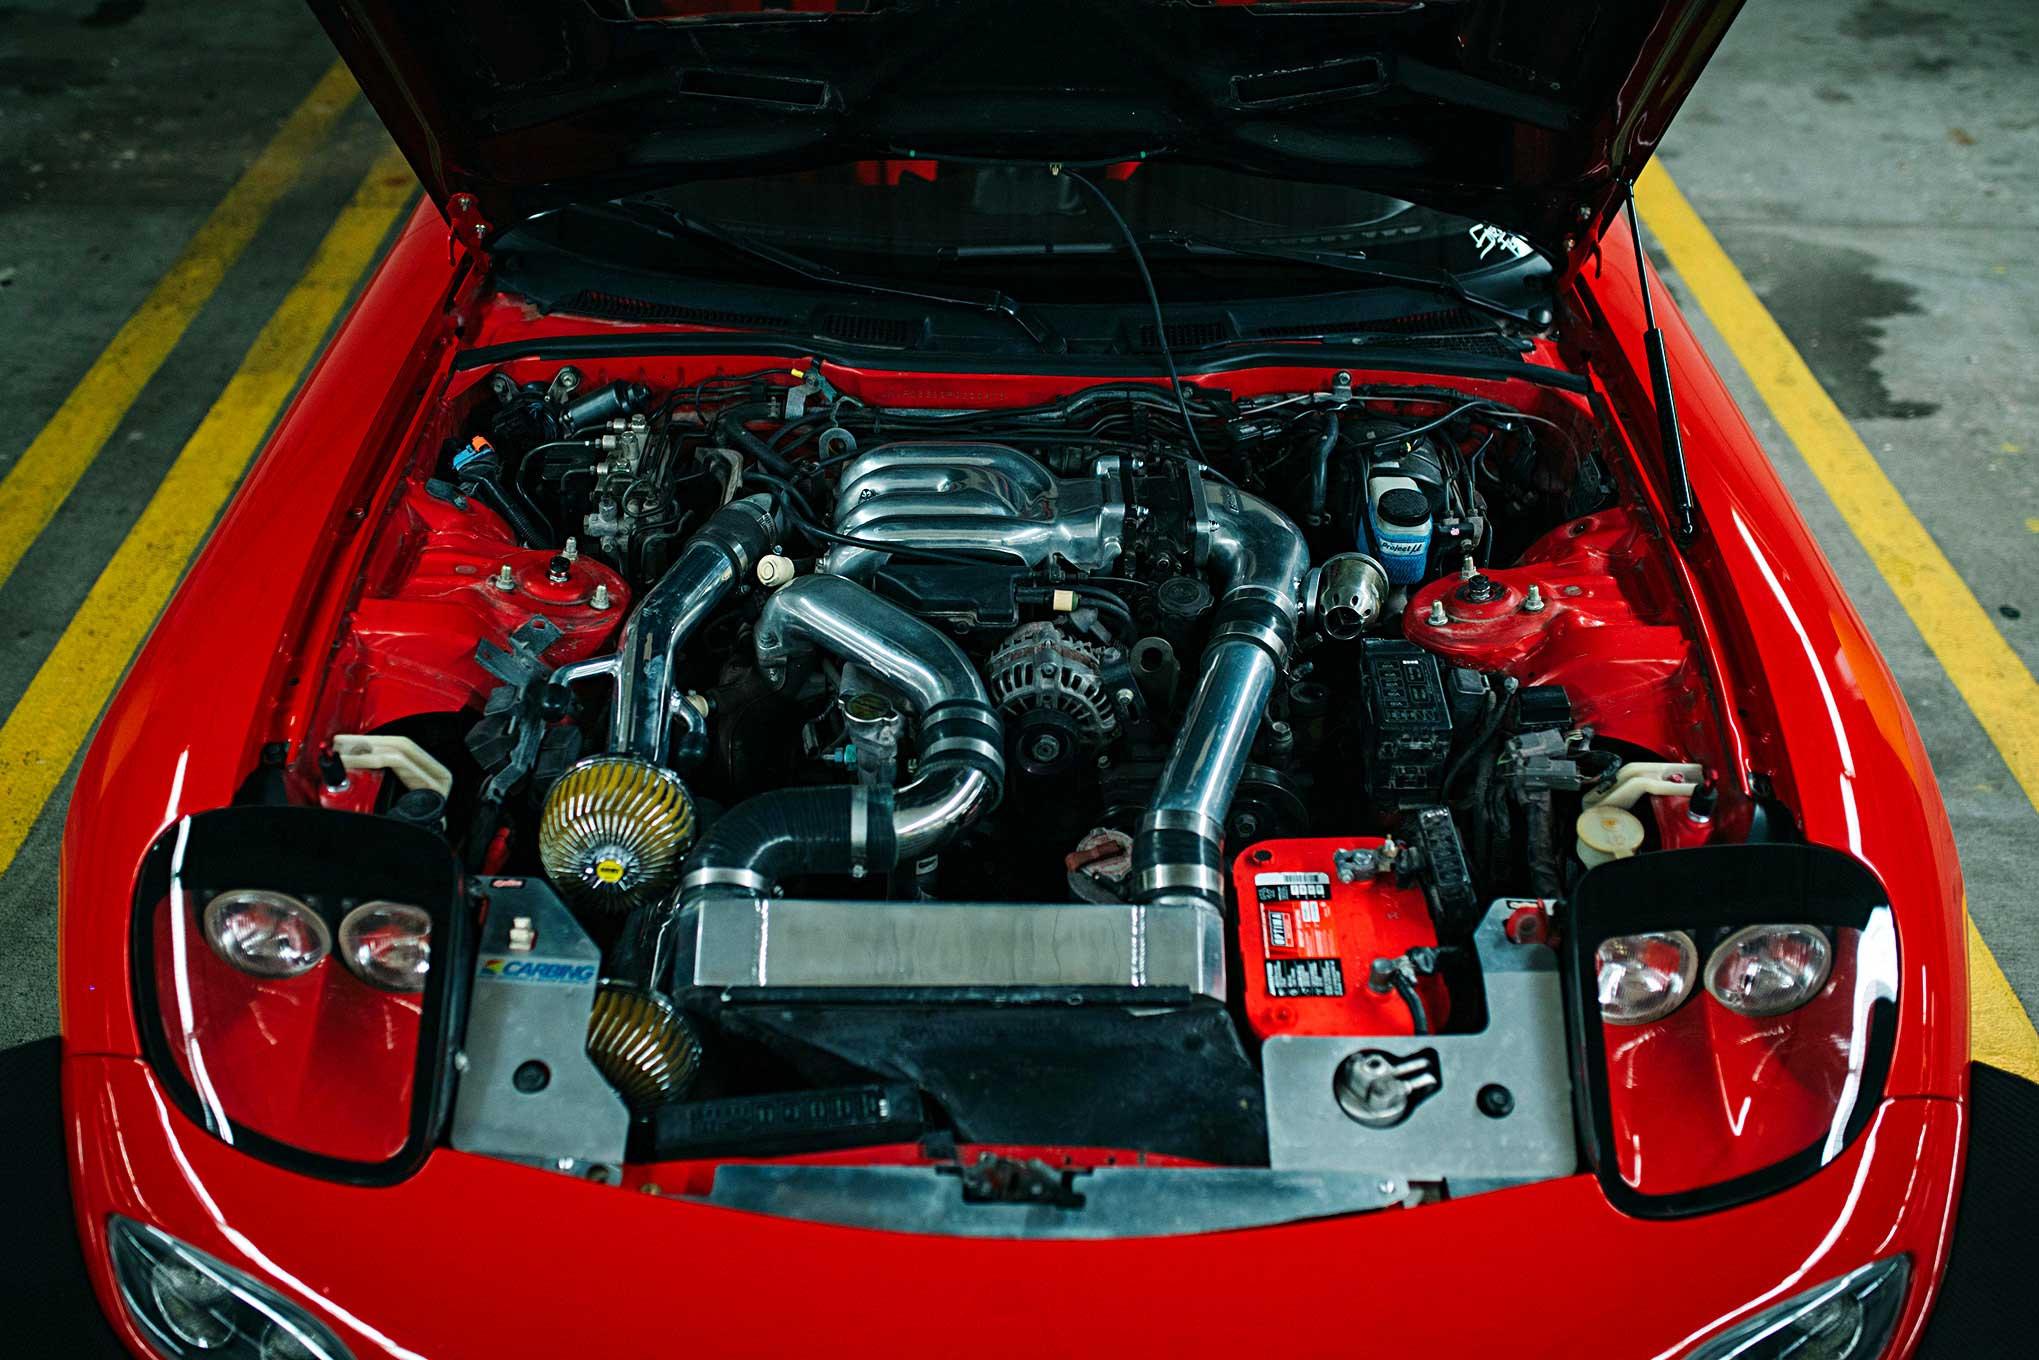 medium resolution of 1993 mazda rx7 13b rew engine